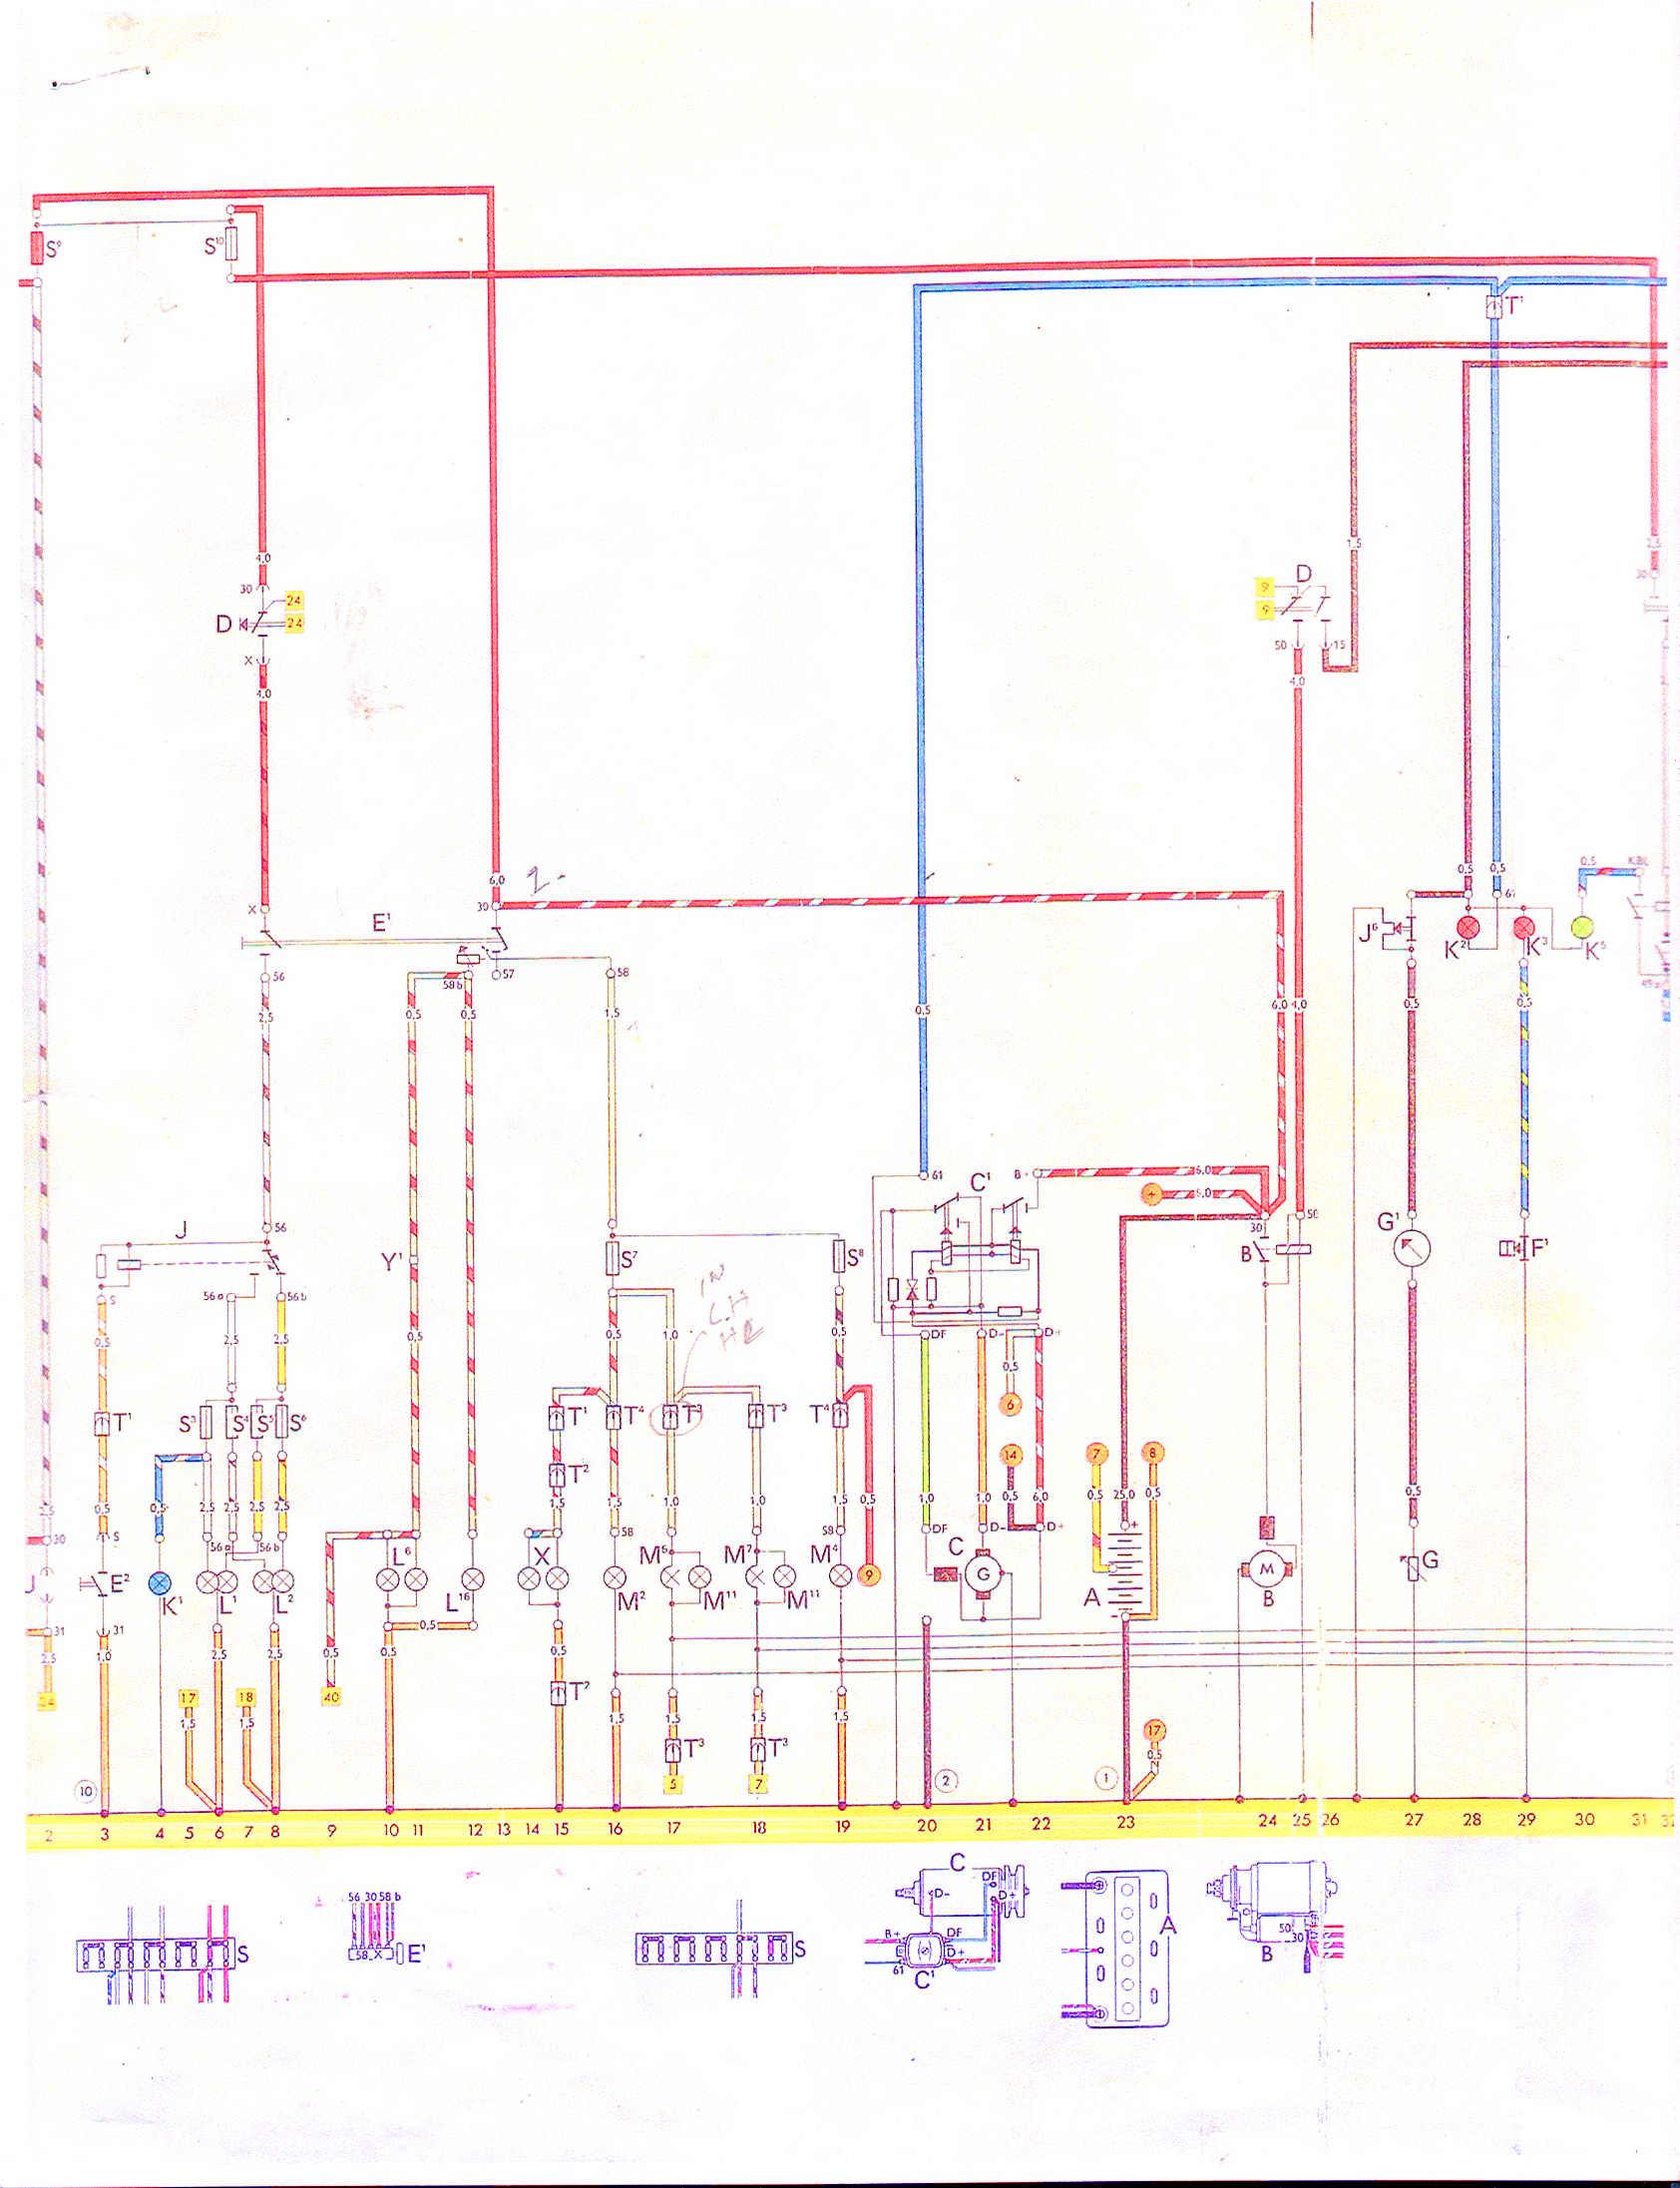 code alarm ca1053 wiring diagram air conditioning for car 3 excalibur remote start